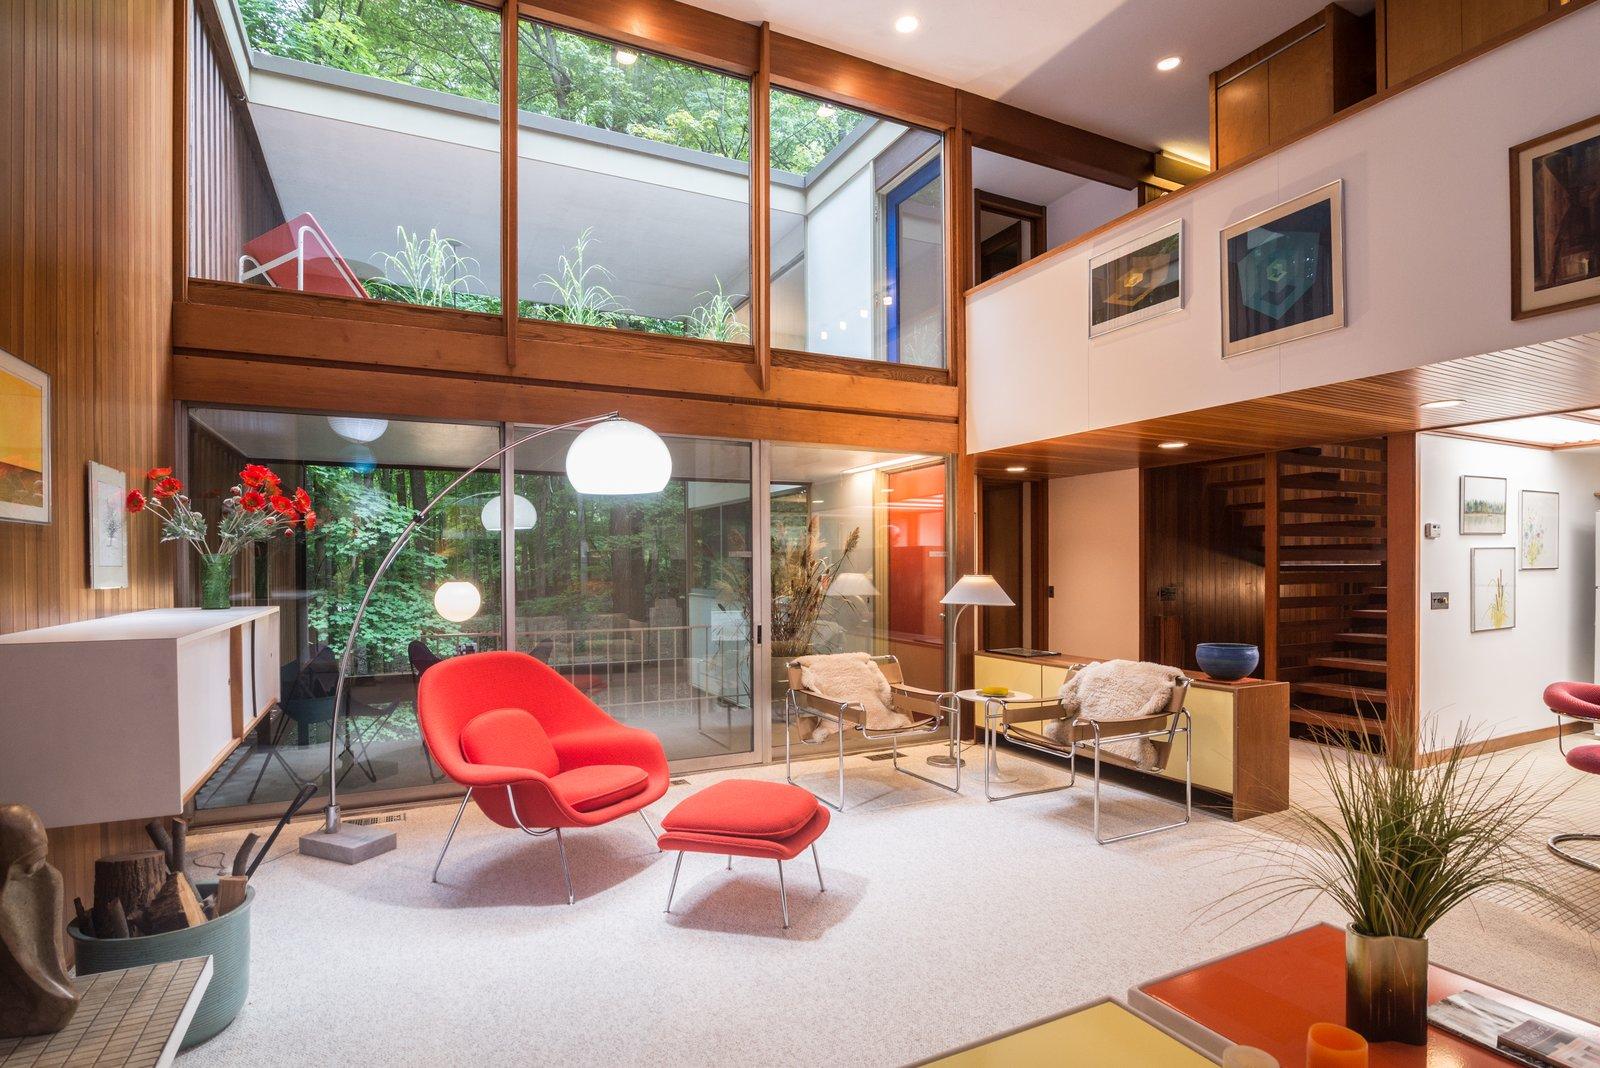 Balogh House by Tivadar Balogh living room